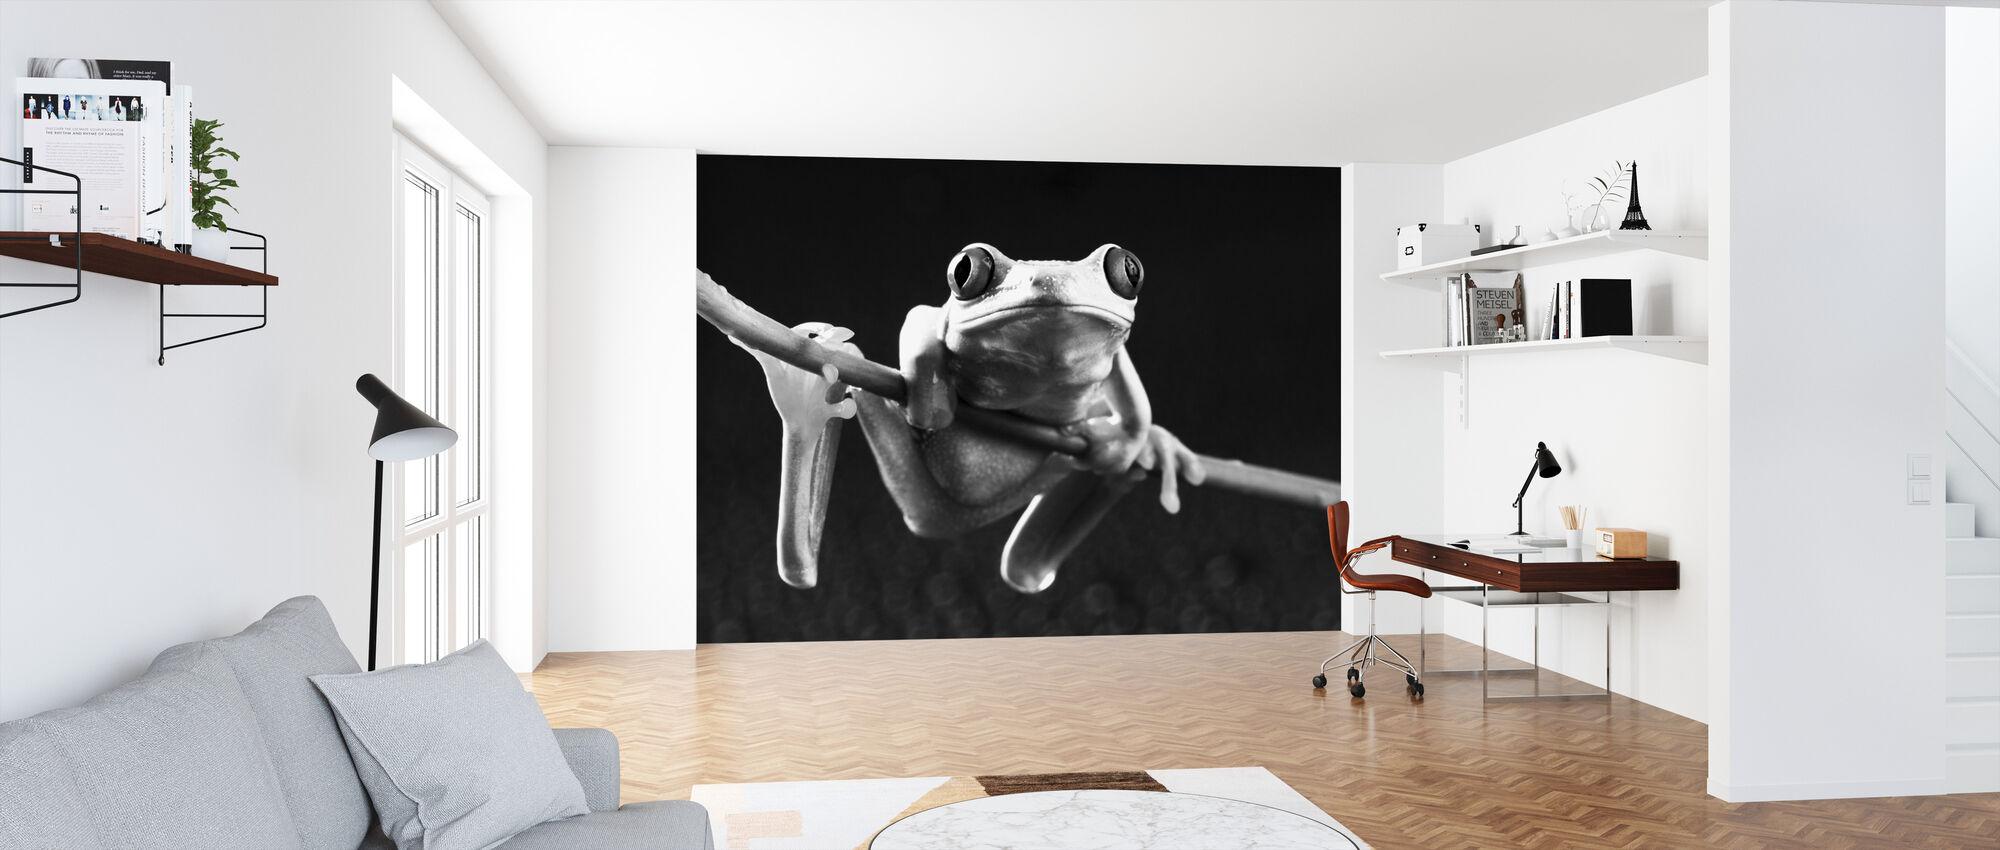 Red frog - b/w - Wallpaper - Office